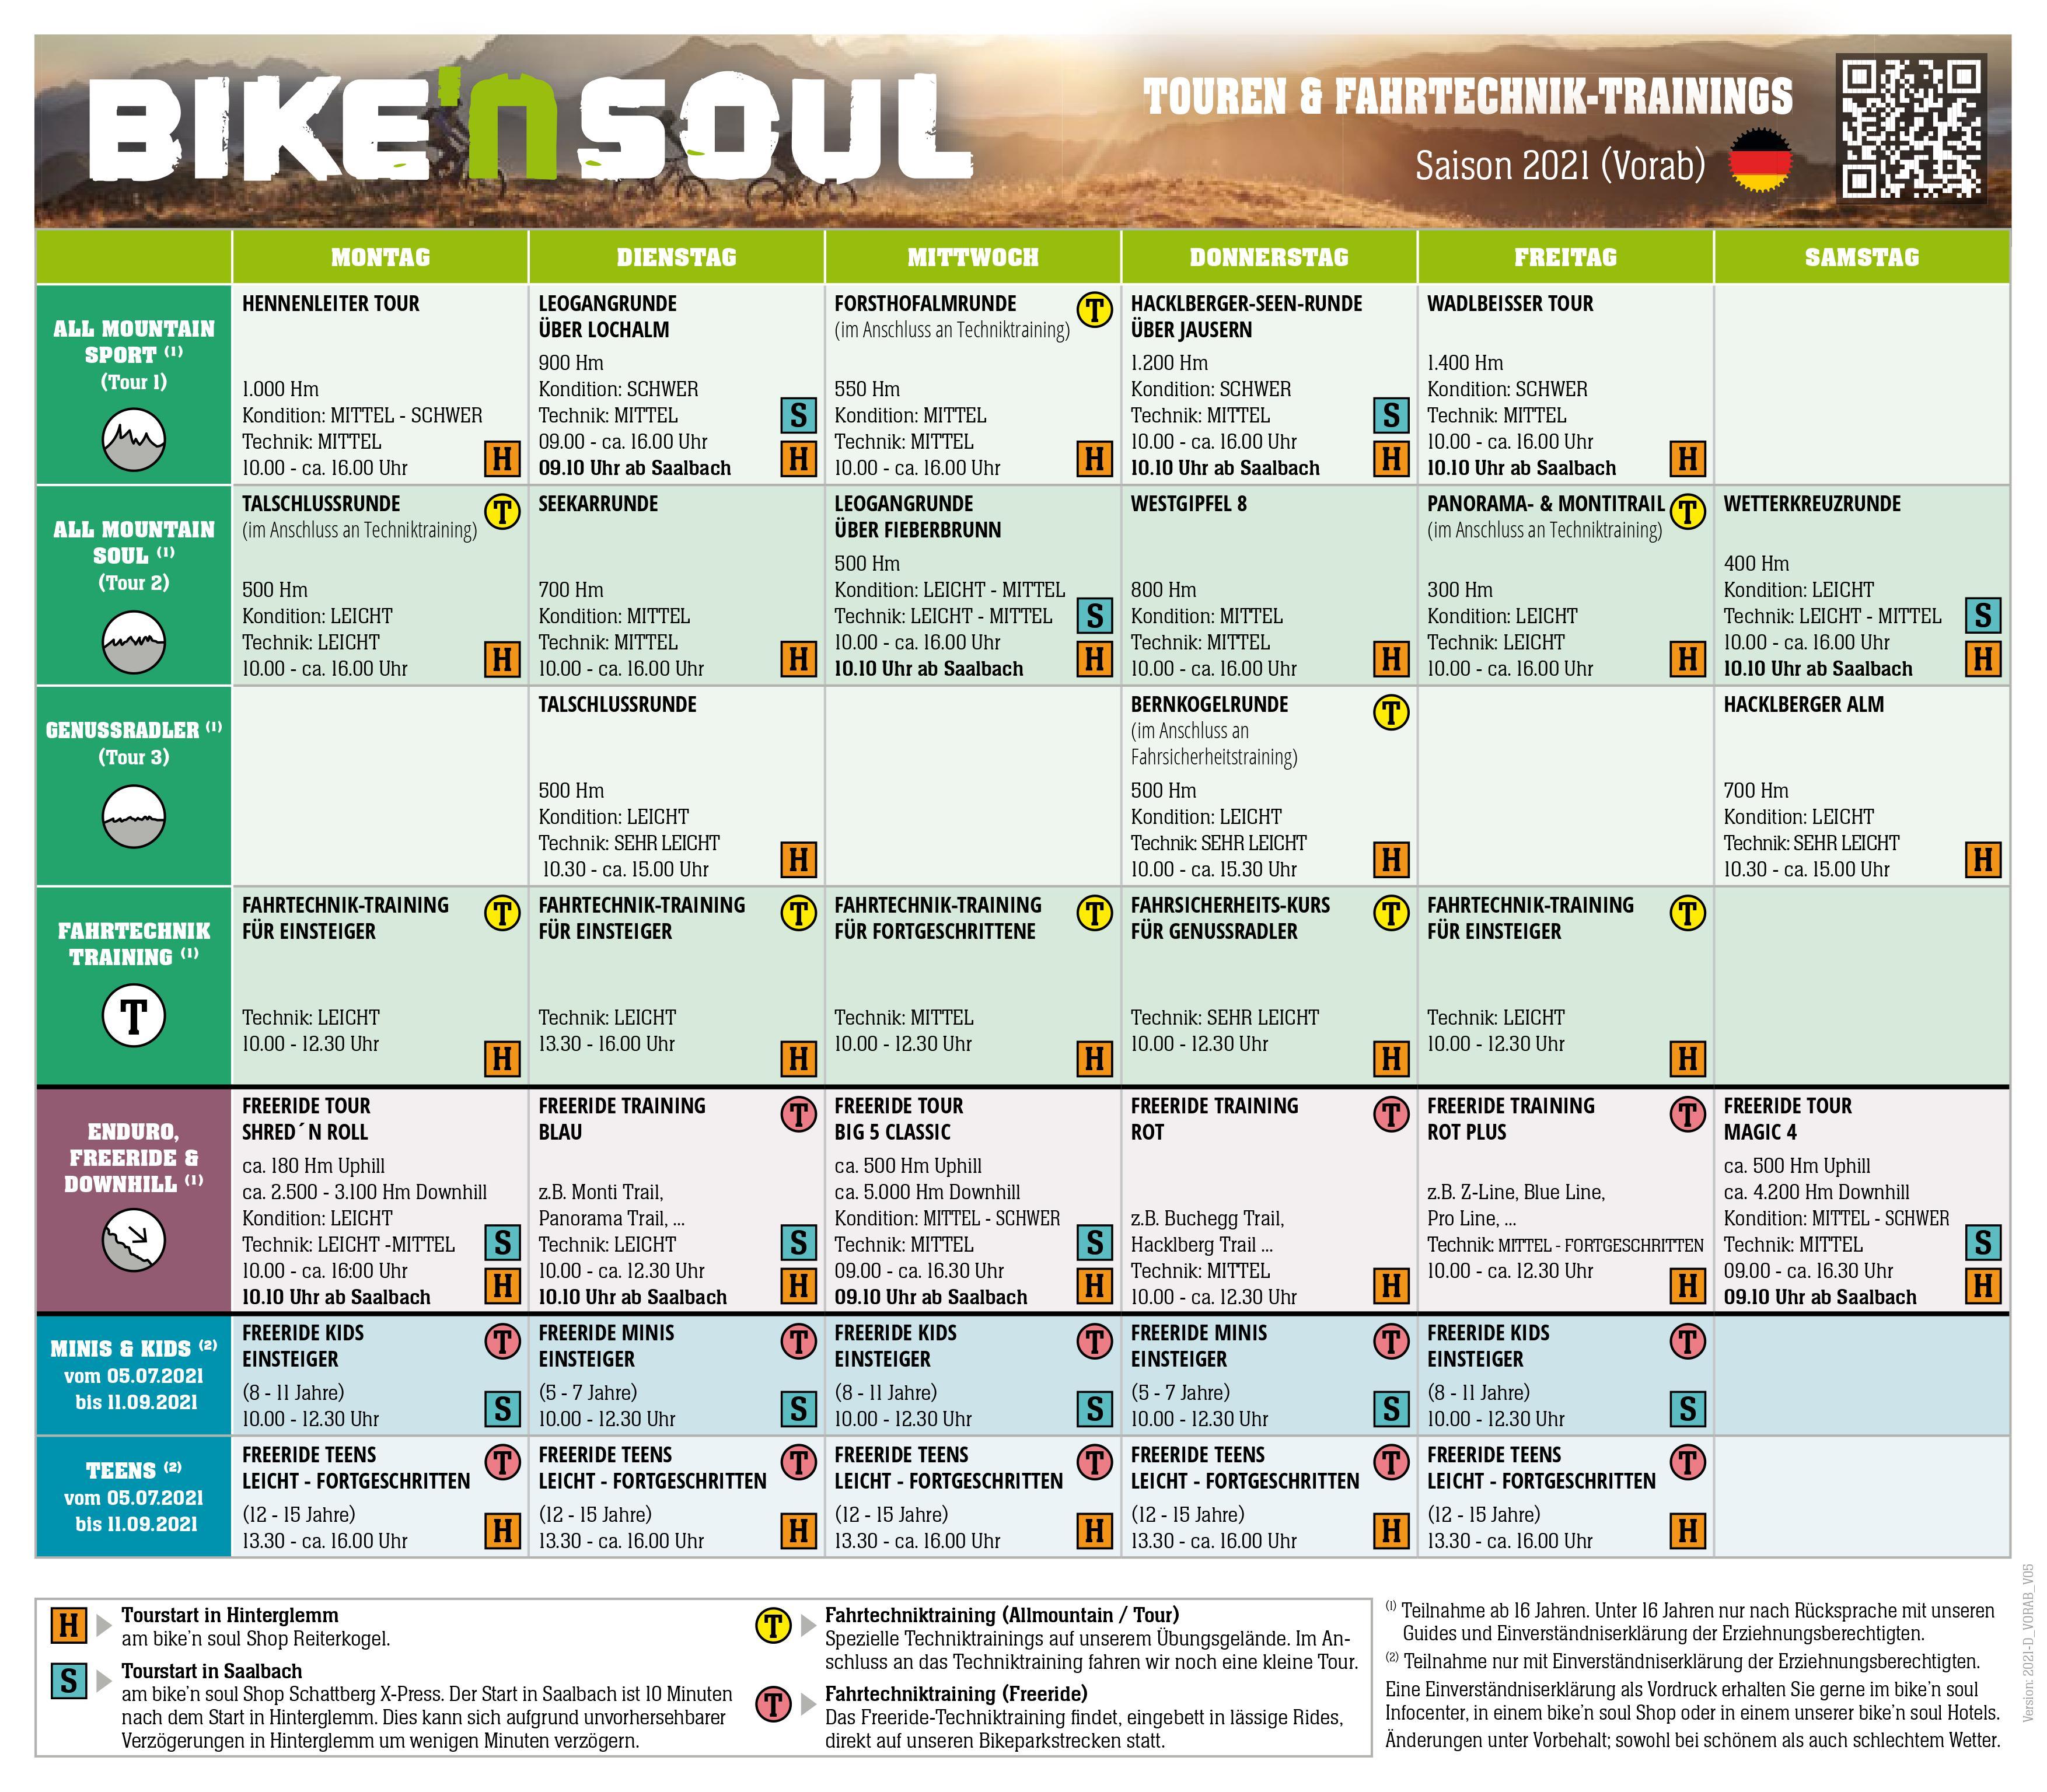 Bike Soul Wochenprogramm der Touren 2020